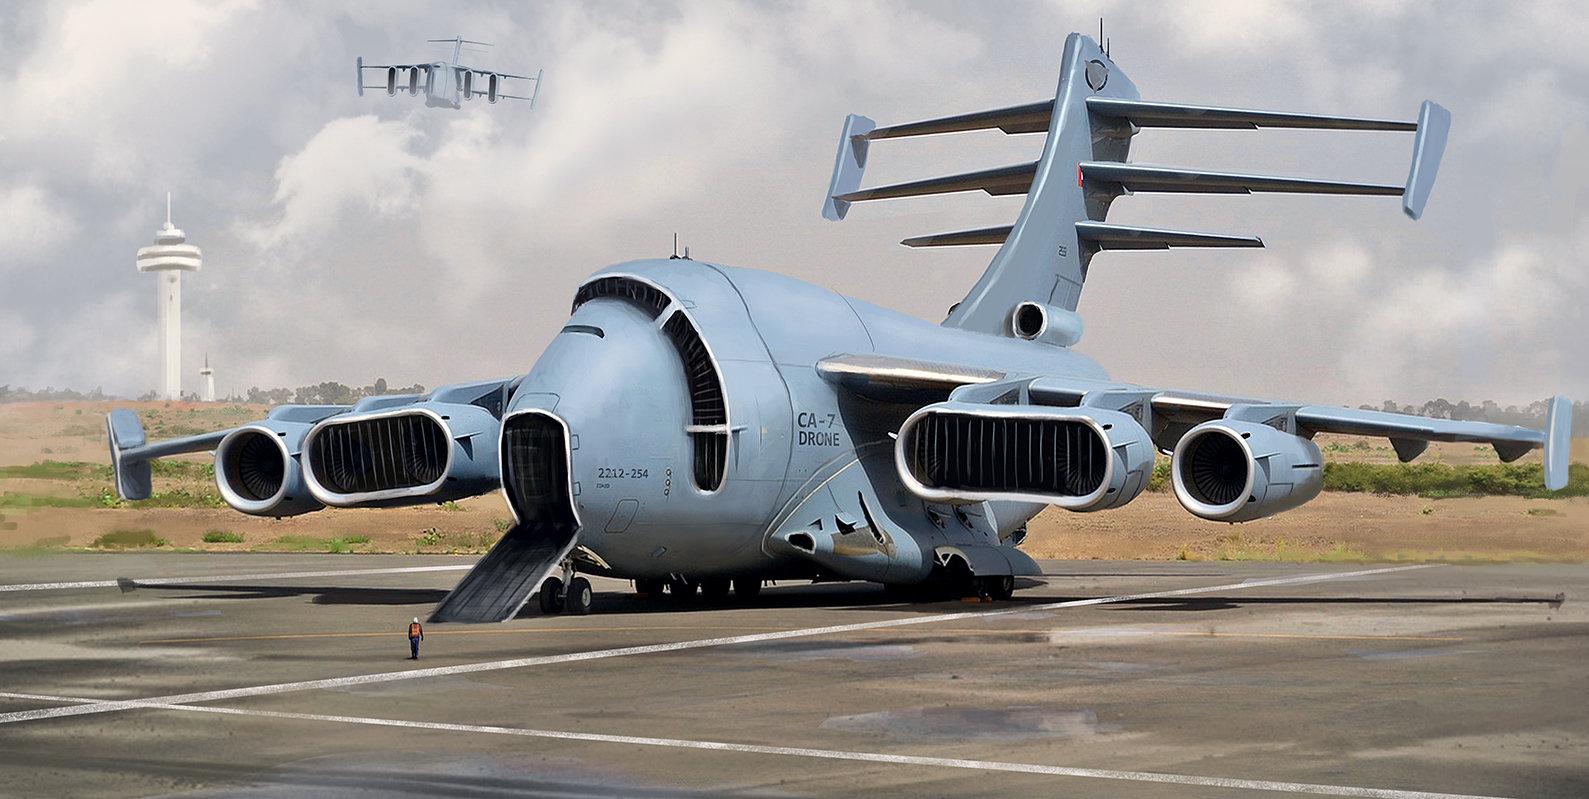 ArtStation - Future cargo plane, mathieu lamble